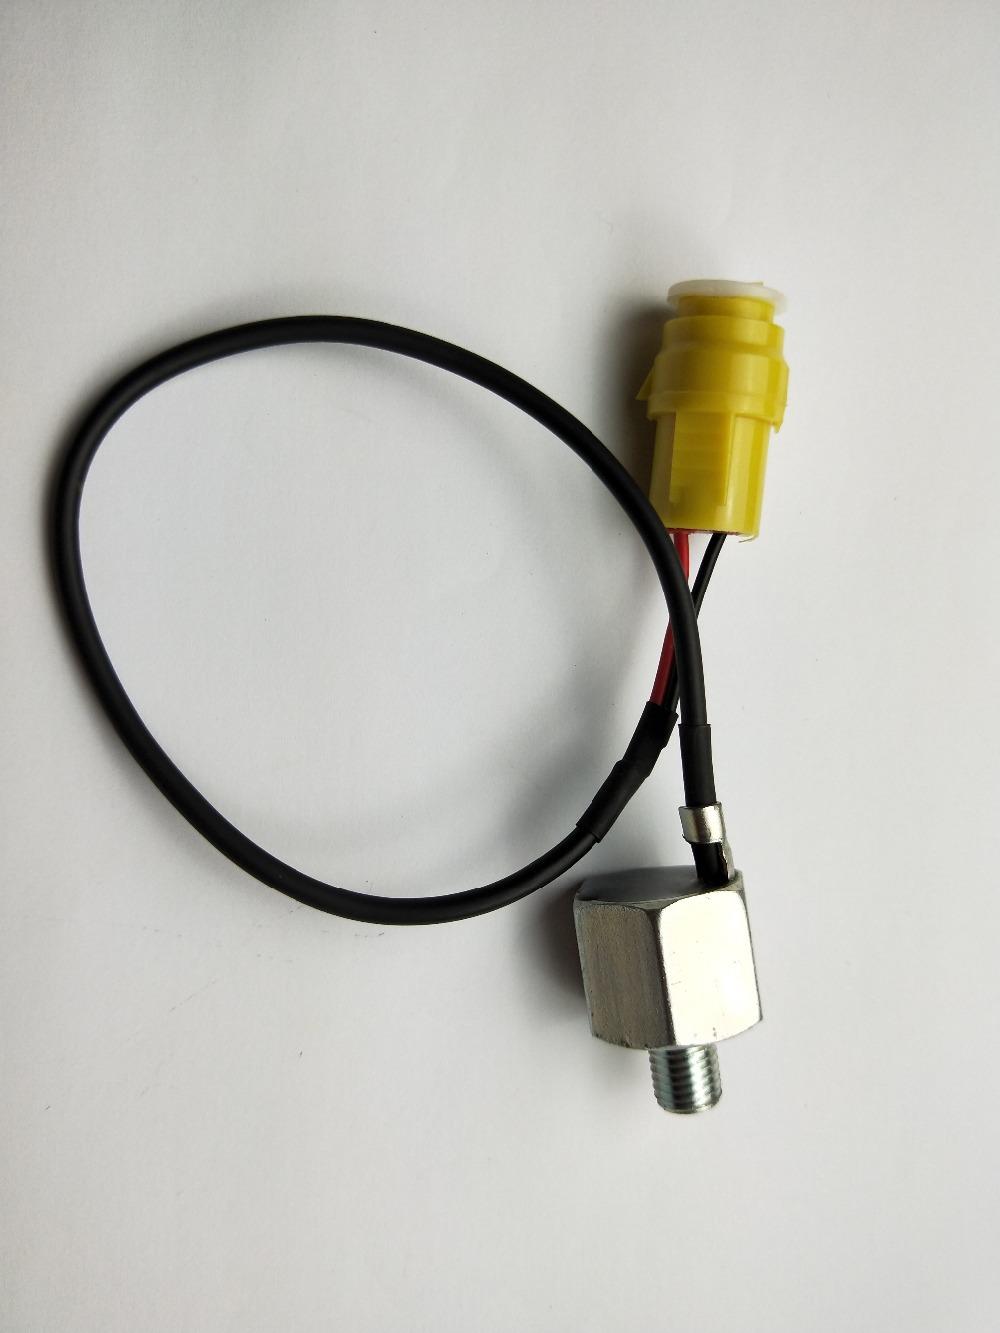 KNOCK Sensor for Mitsubishi, E1T25171A